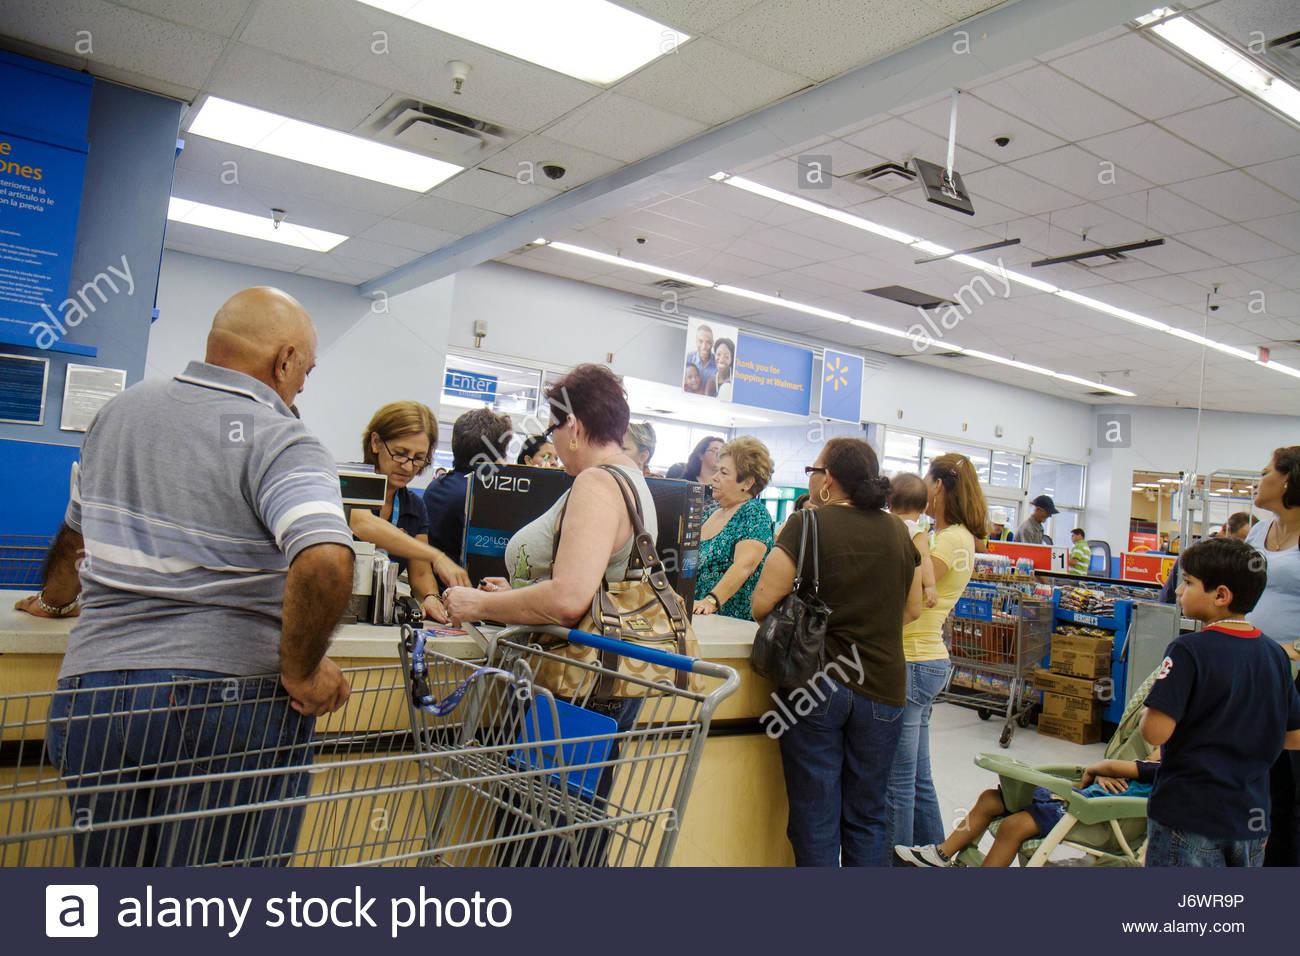 Miami Florida Wal-Mart Walmart shopping customer service